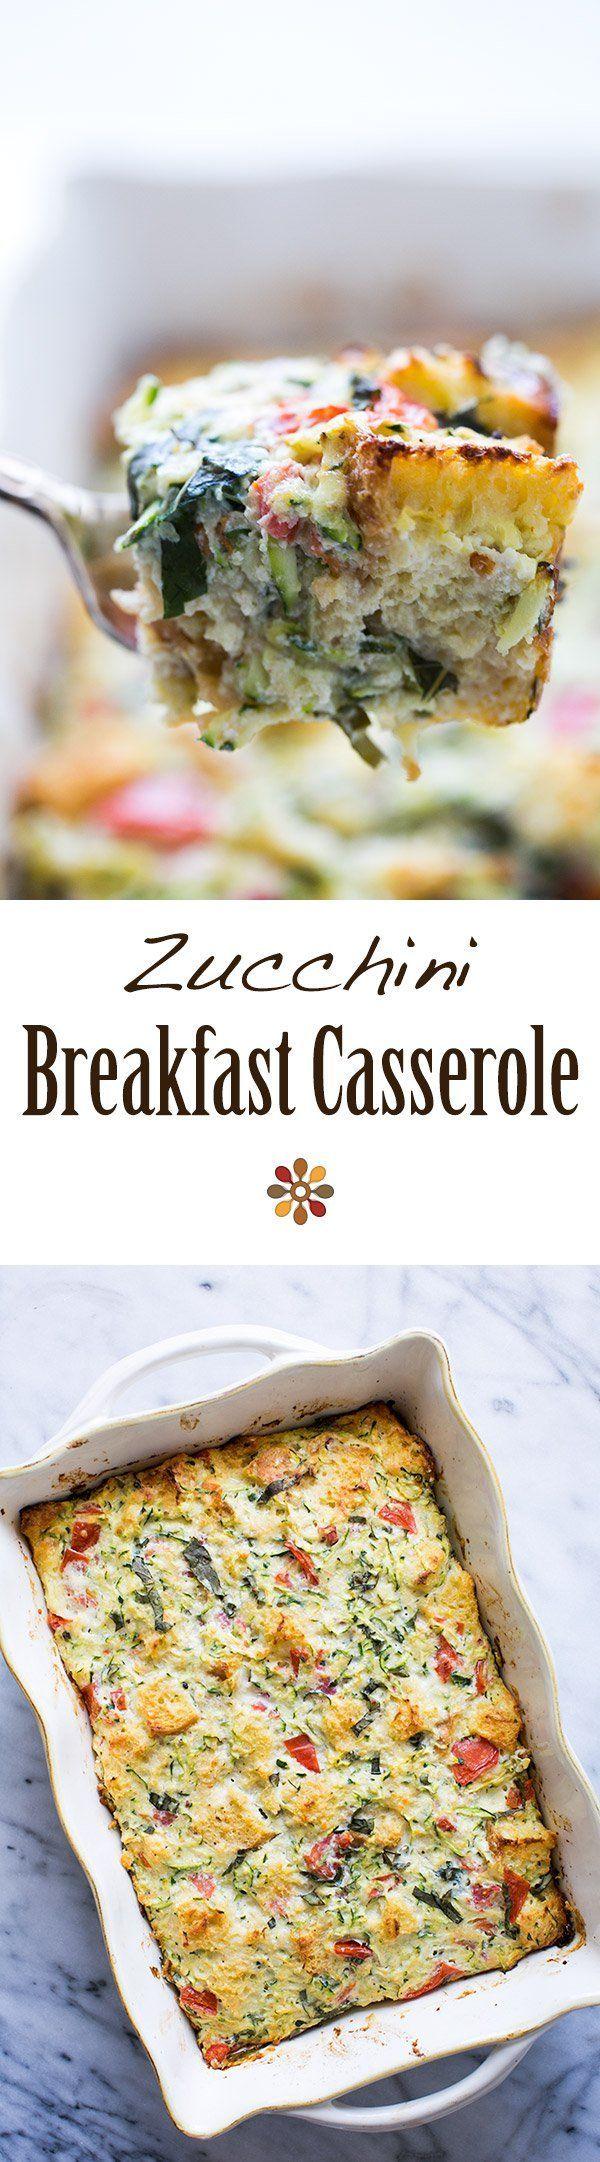 Zucchini Breakfast Casserole - Savory zucchini casserole with eggs, ricotta cheese, Parmesan, plum tomatoes, bread, and basil. Zucchini ricotta strata.